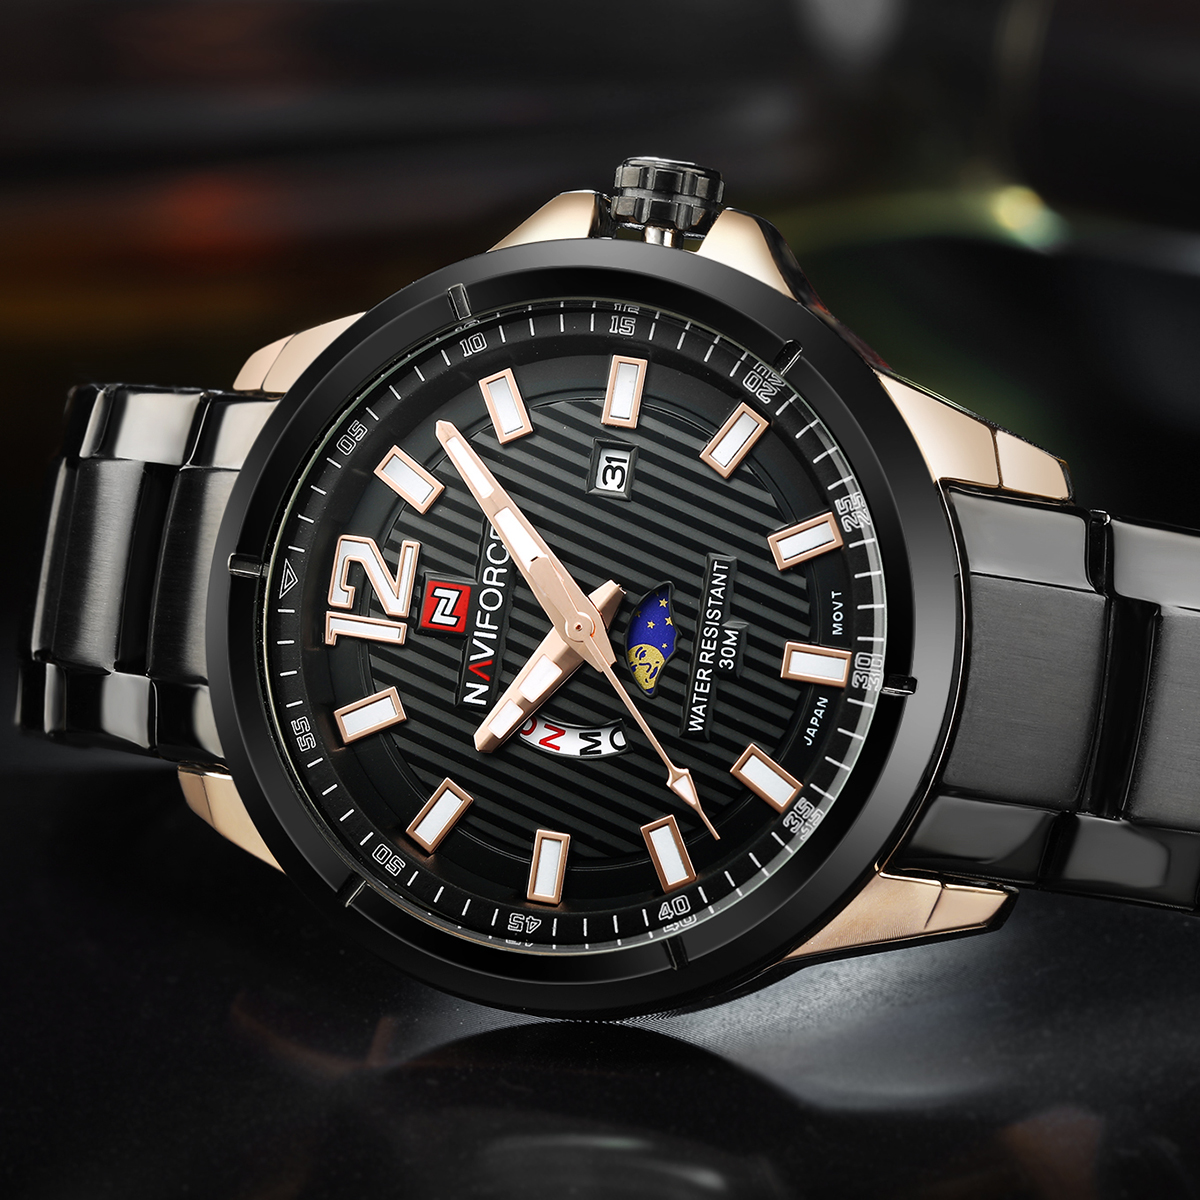 Watches Men NAVIFORCE 9084 Luxury Brand Full Steel Quartz Clock Dual calendar Watch Waterproof Wrist Watch Relogio Masculino masculino masculinos relogiosmasculino watch - AliExpress